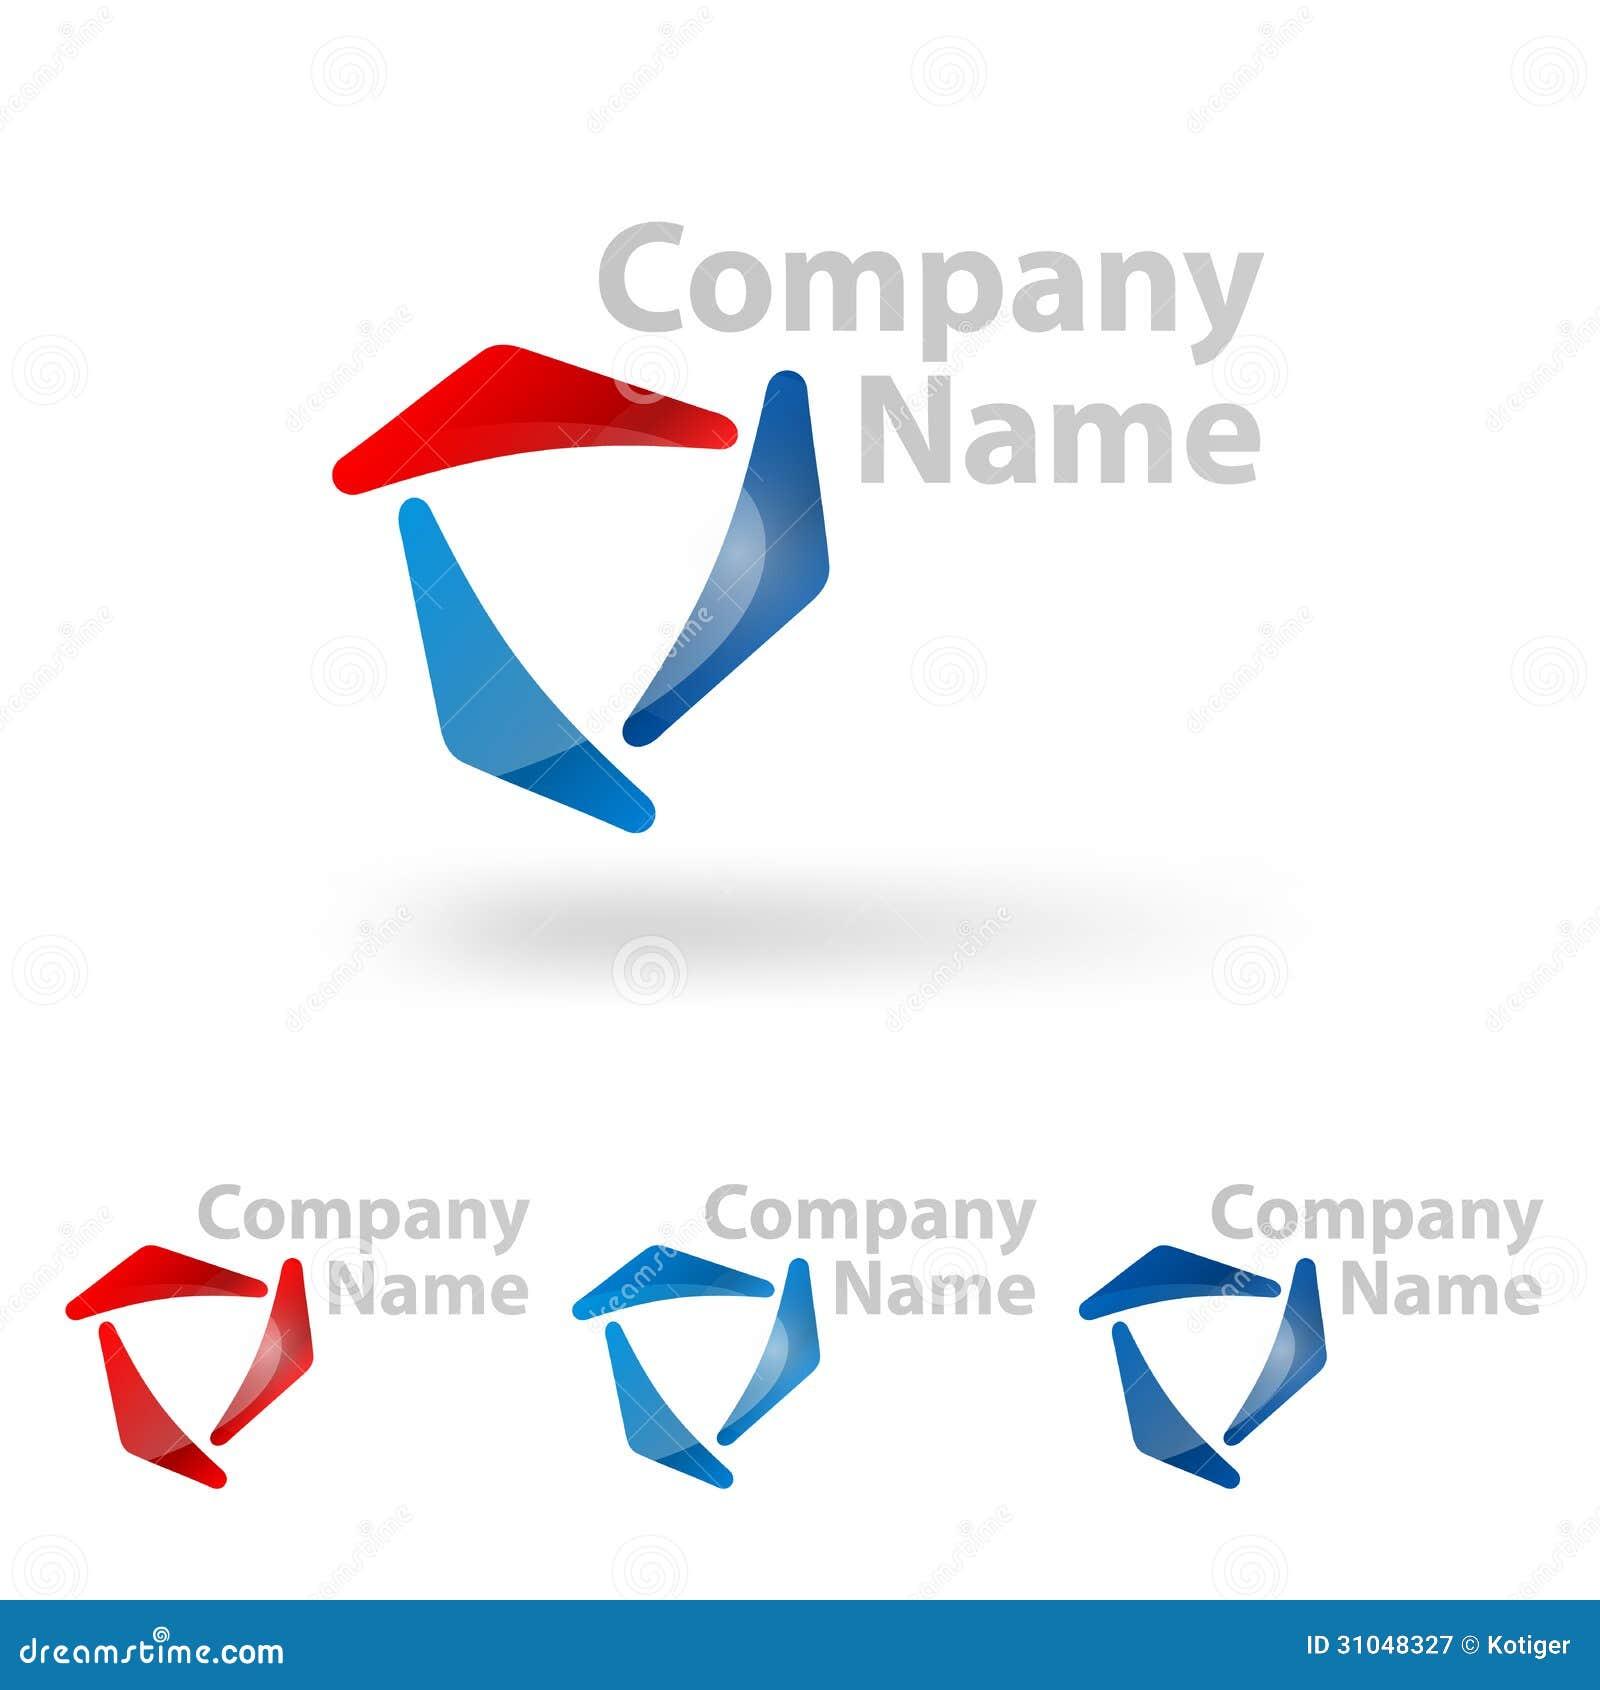 Triangle Logo Company Name Design Royalty Free Stock Photography ...